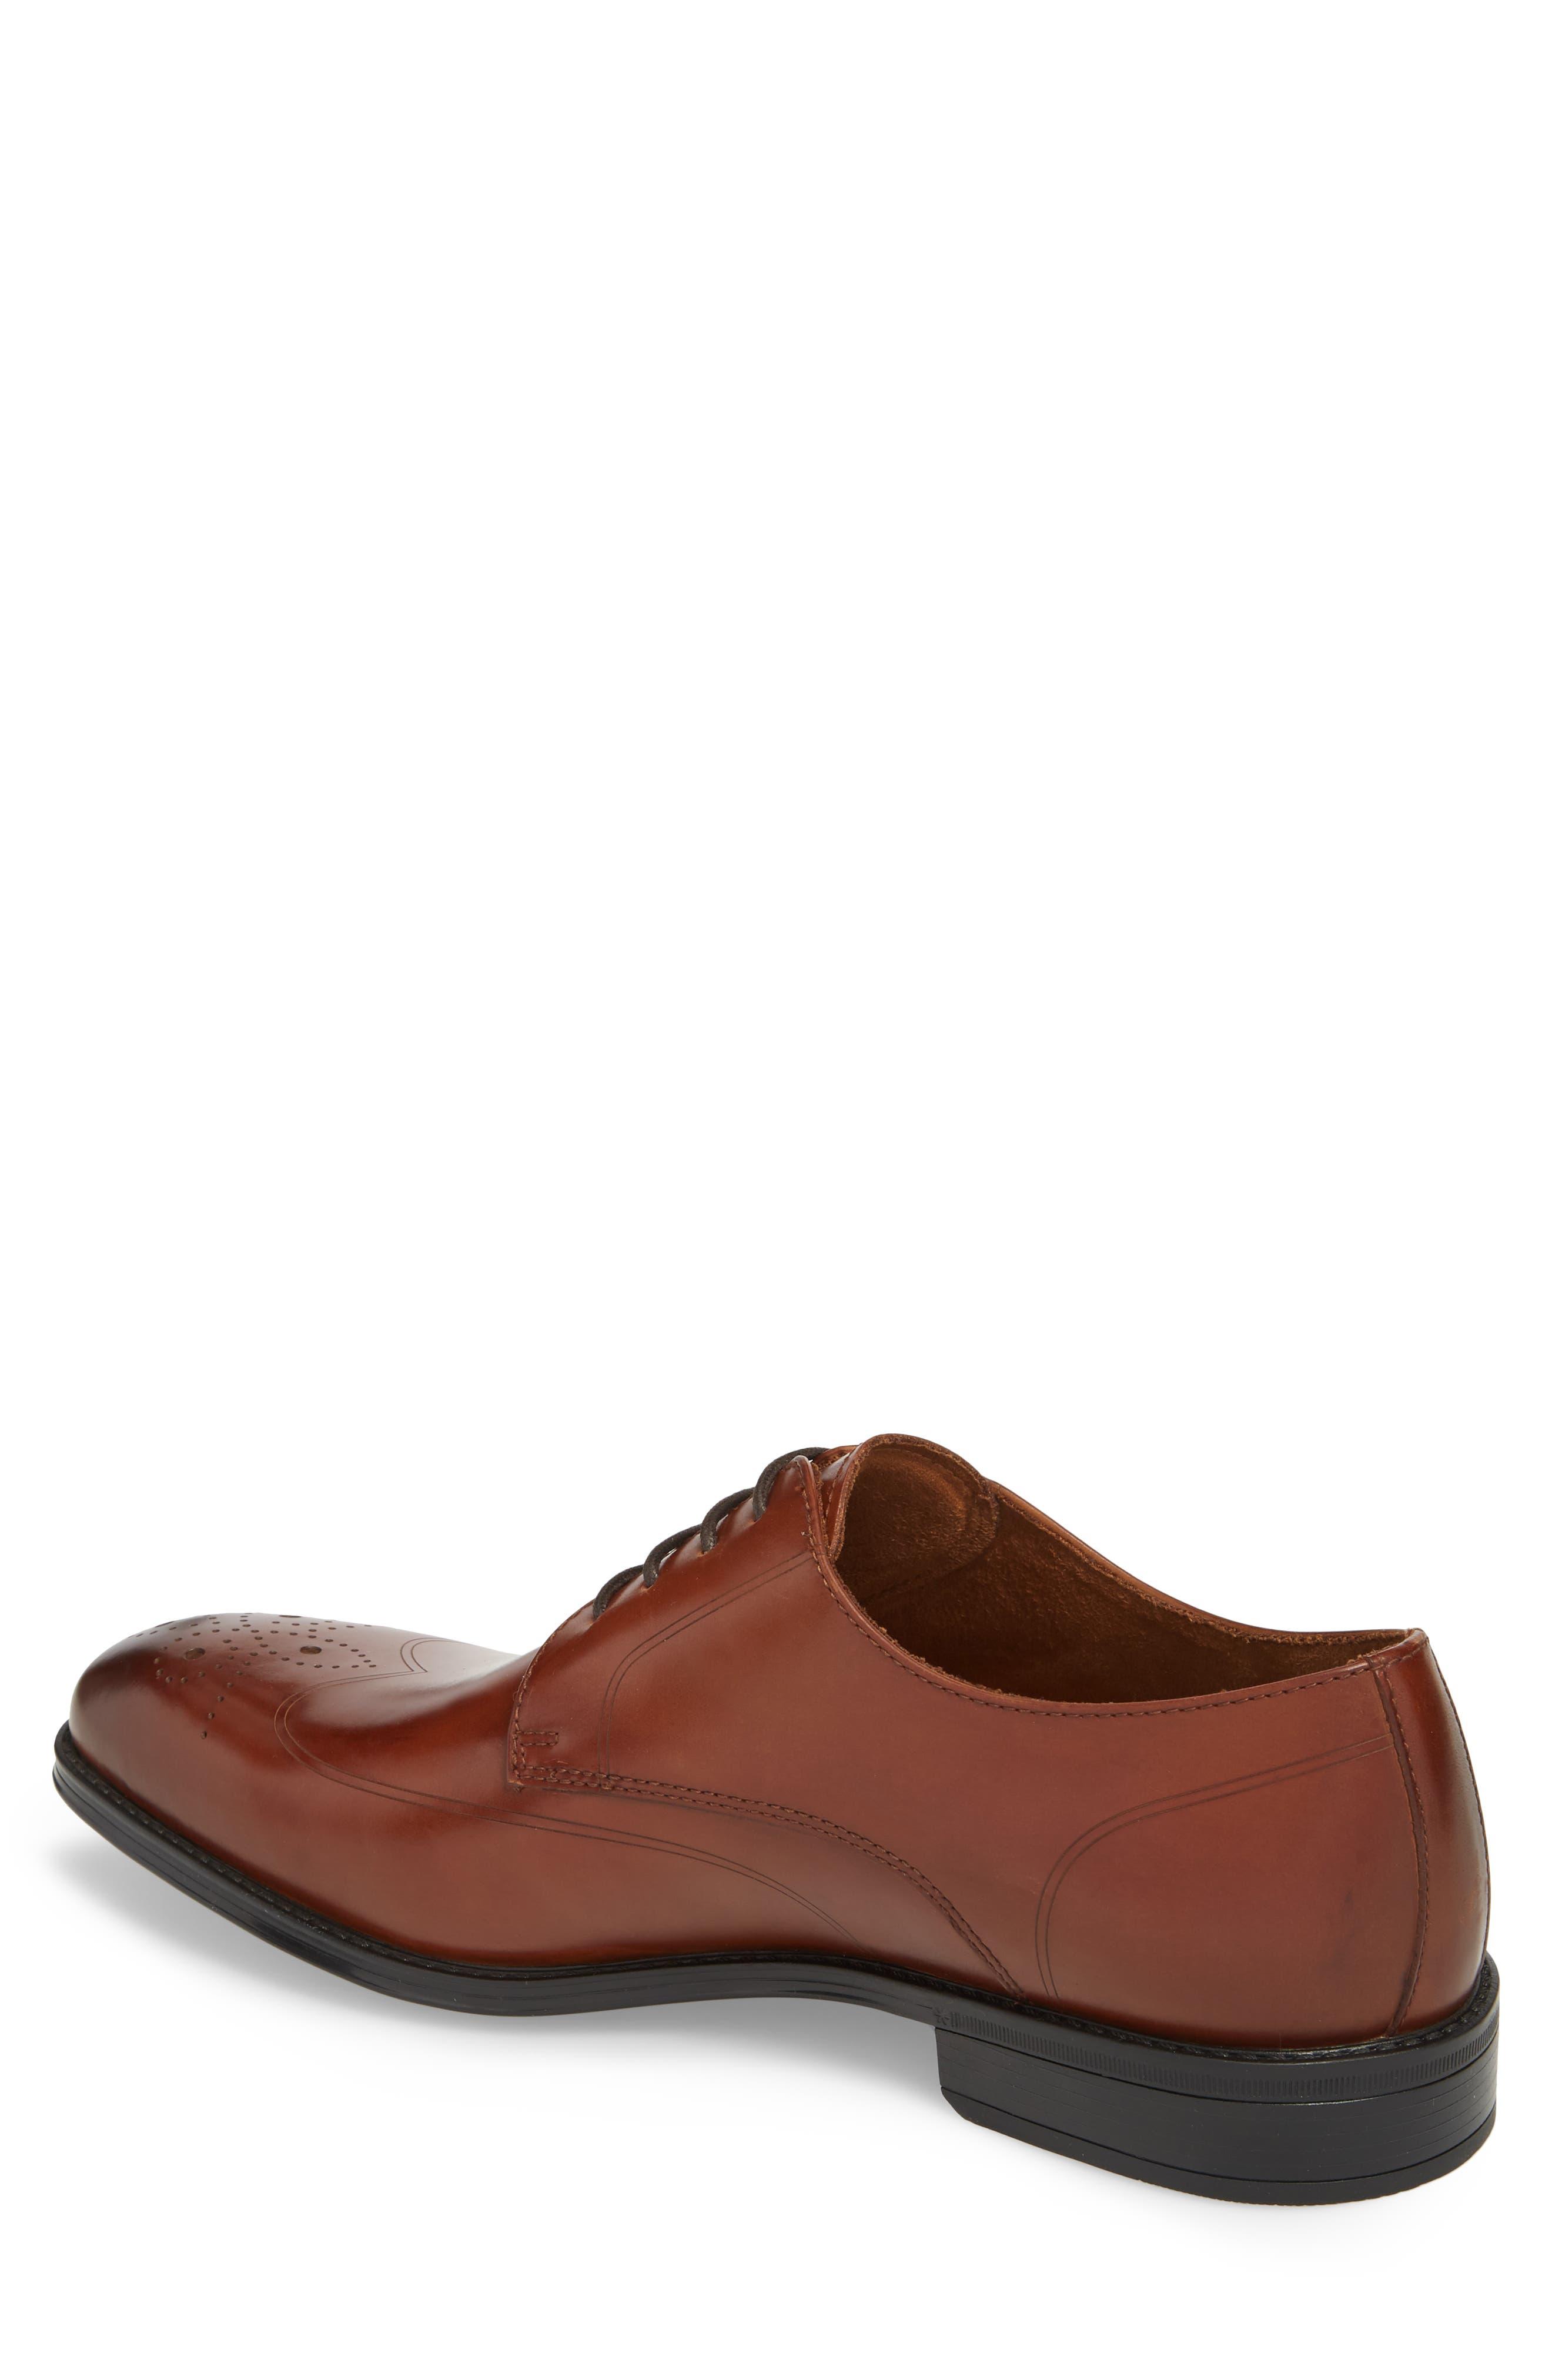 Kenneth Cole New York Men's Abbott Plain Toe Lace Up Oxford